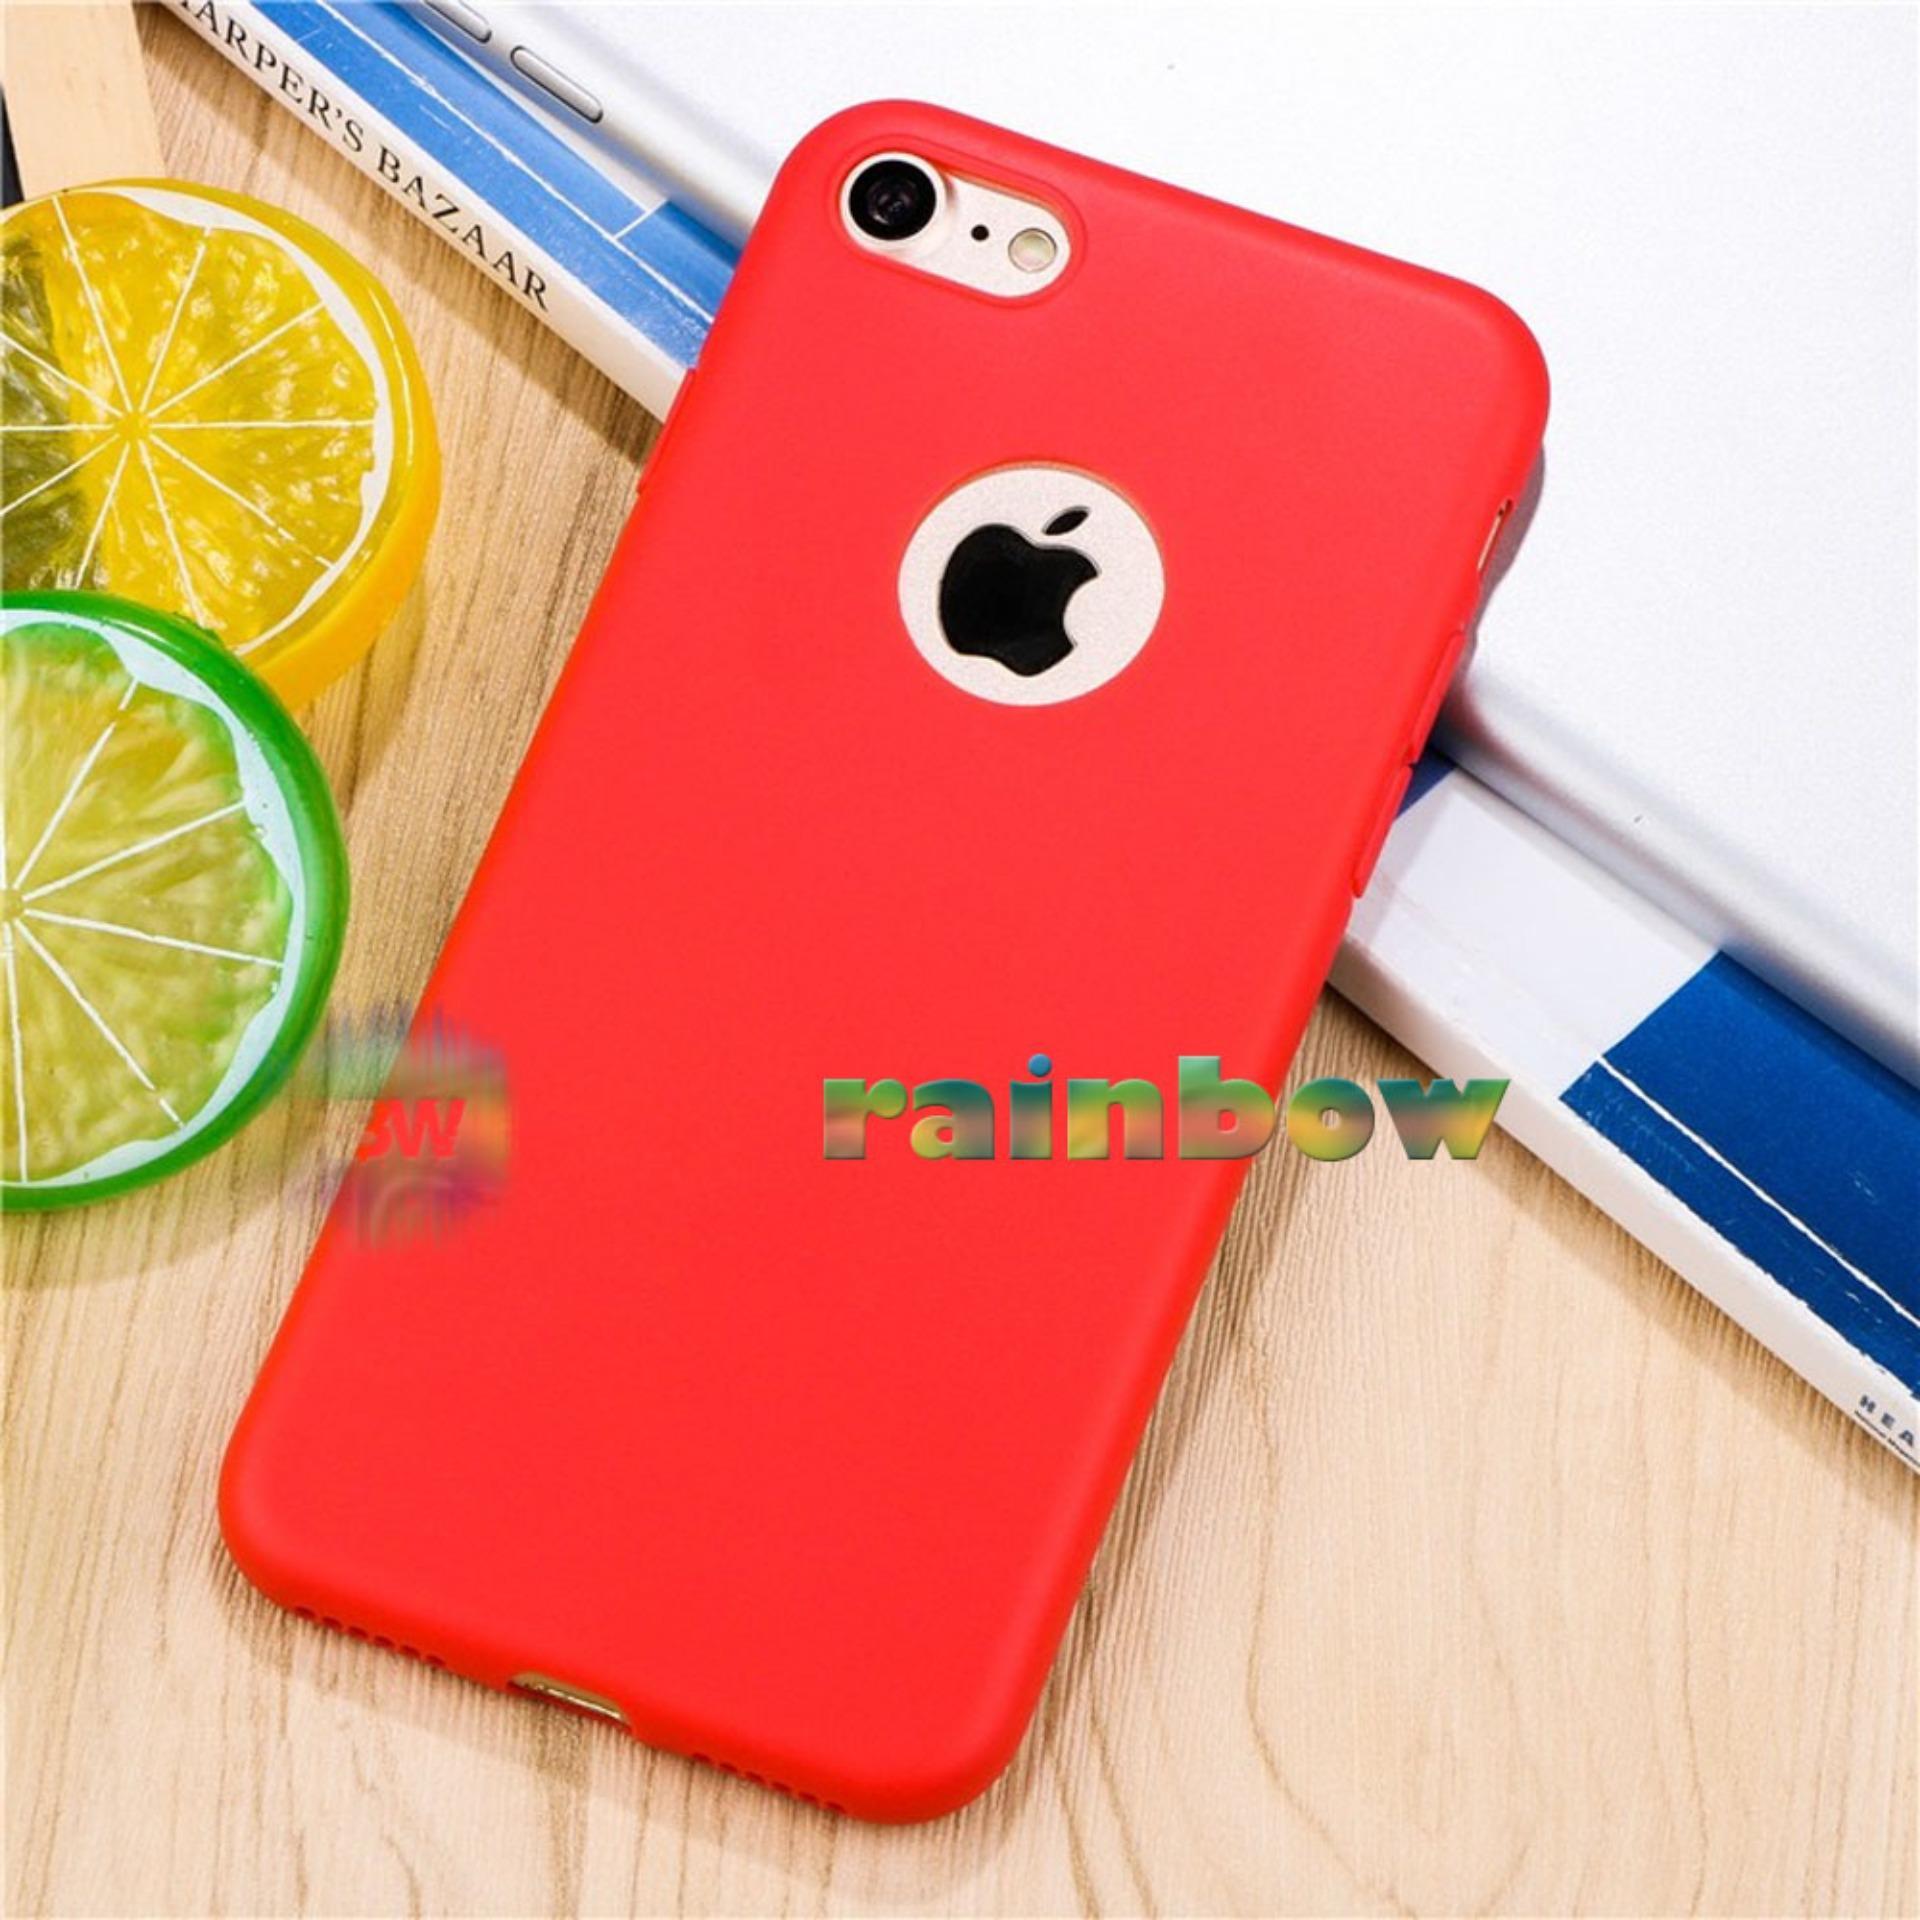 Lize Apple Iphone5 / Iphone 5 / Iphone 5G / Iphone 5S Ori / Softshell / Jelly Case / Soft Case / Soft Back Case / Silicone / Silicon / Silikon / Case Iphone / Case HP / Casing Handphone Iphone 5 - Merah